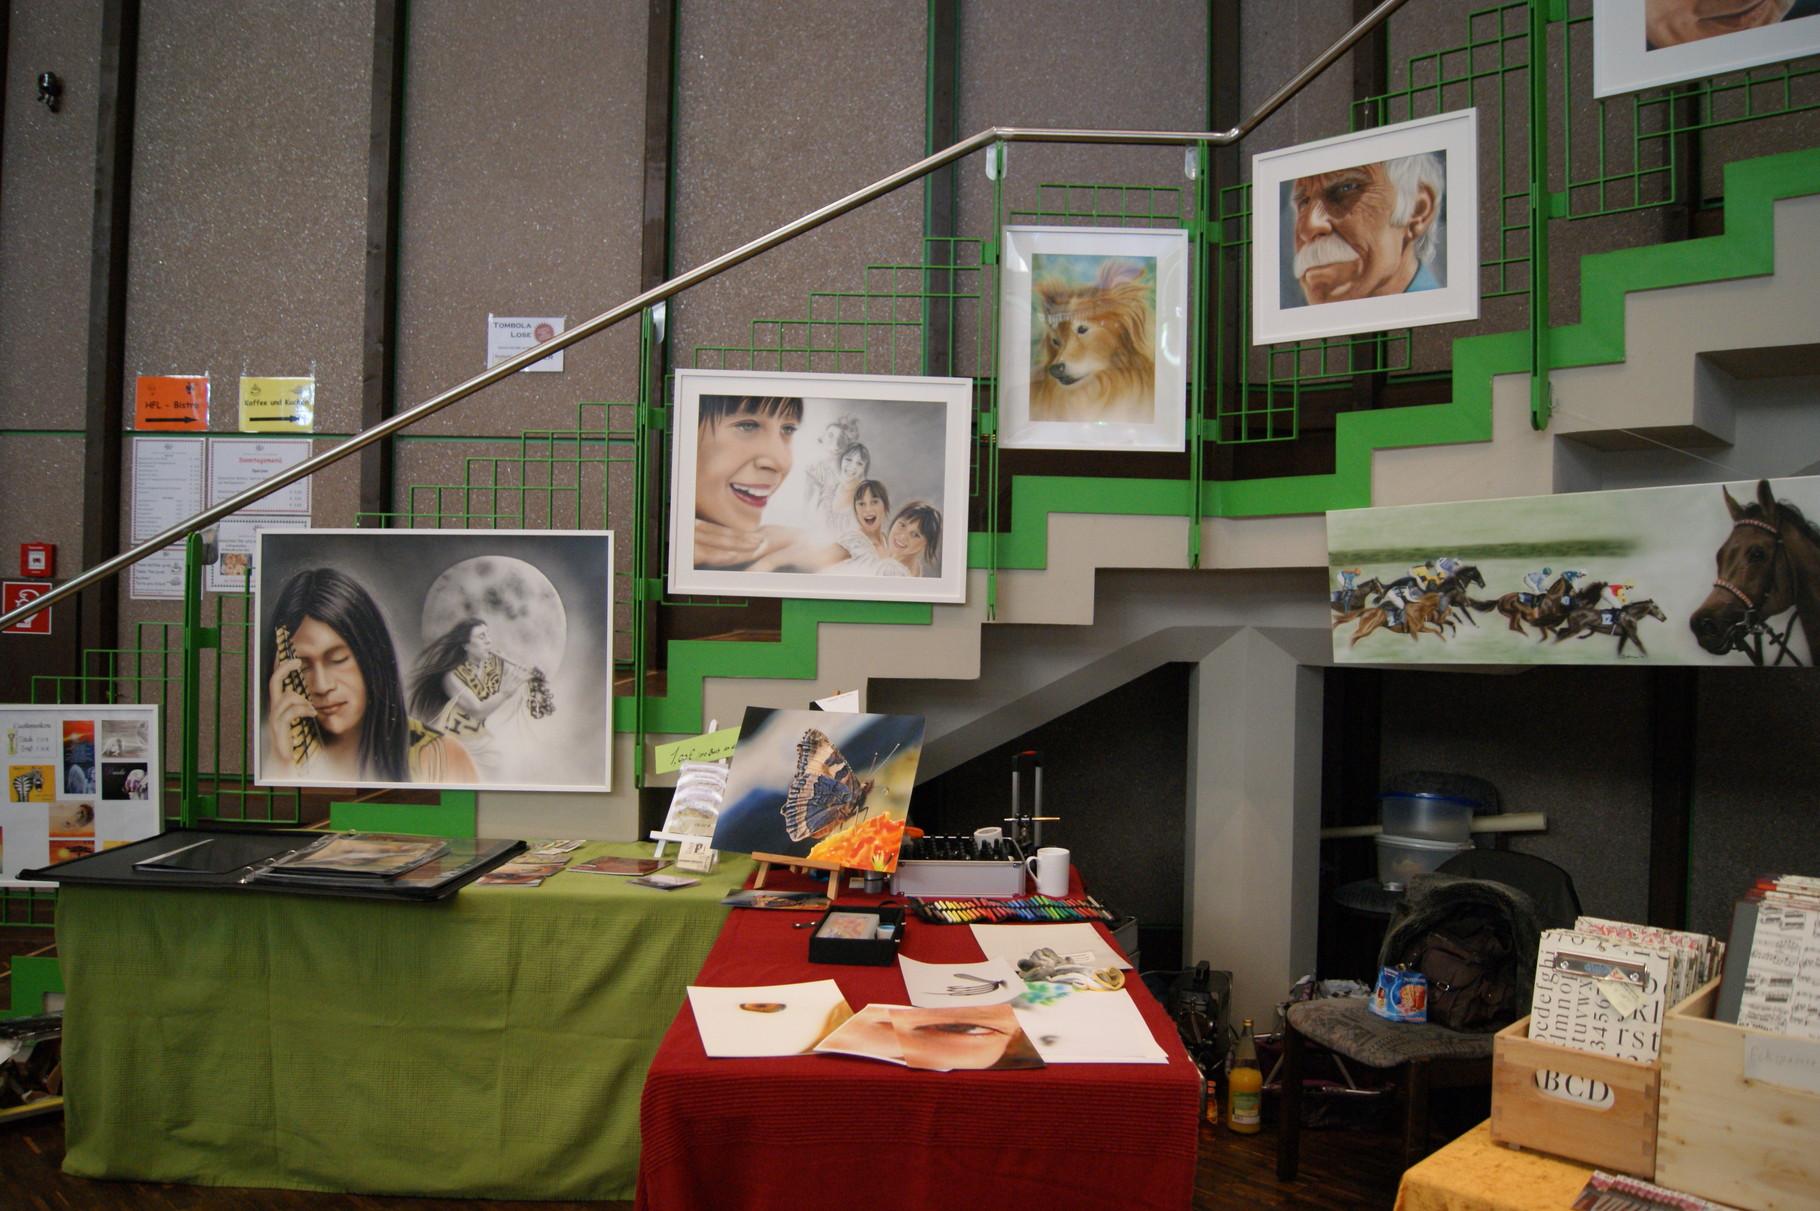 2012 Kunst & Hobby Ausstellung, Linkenheim